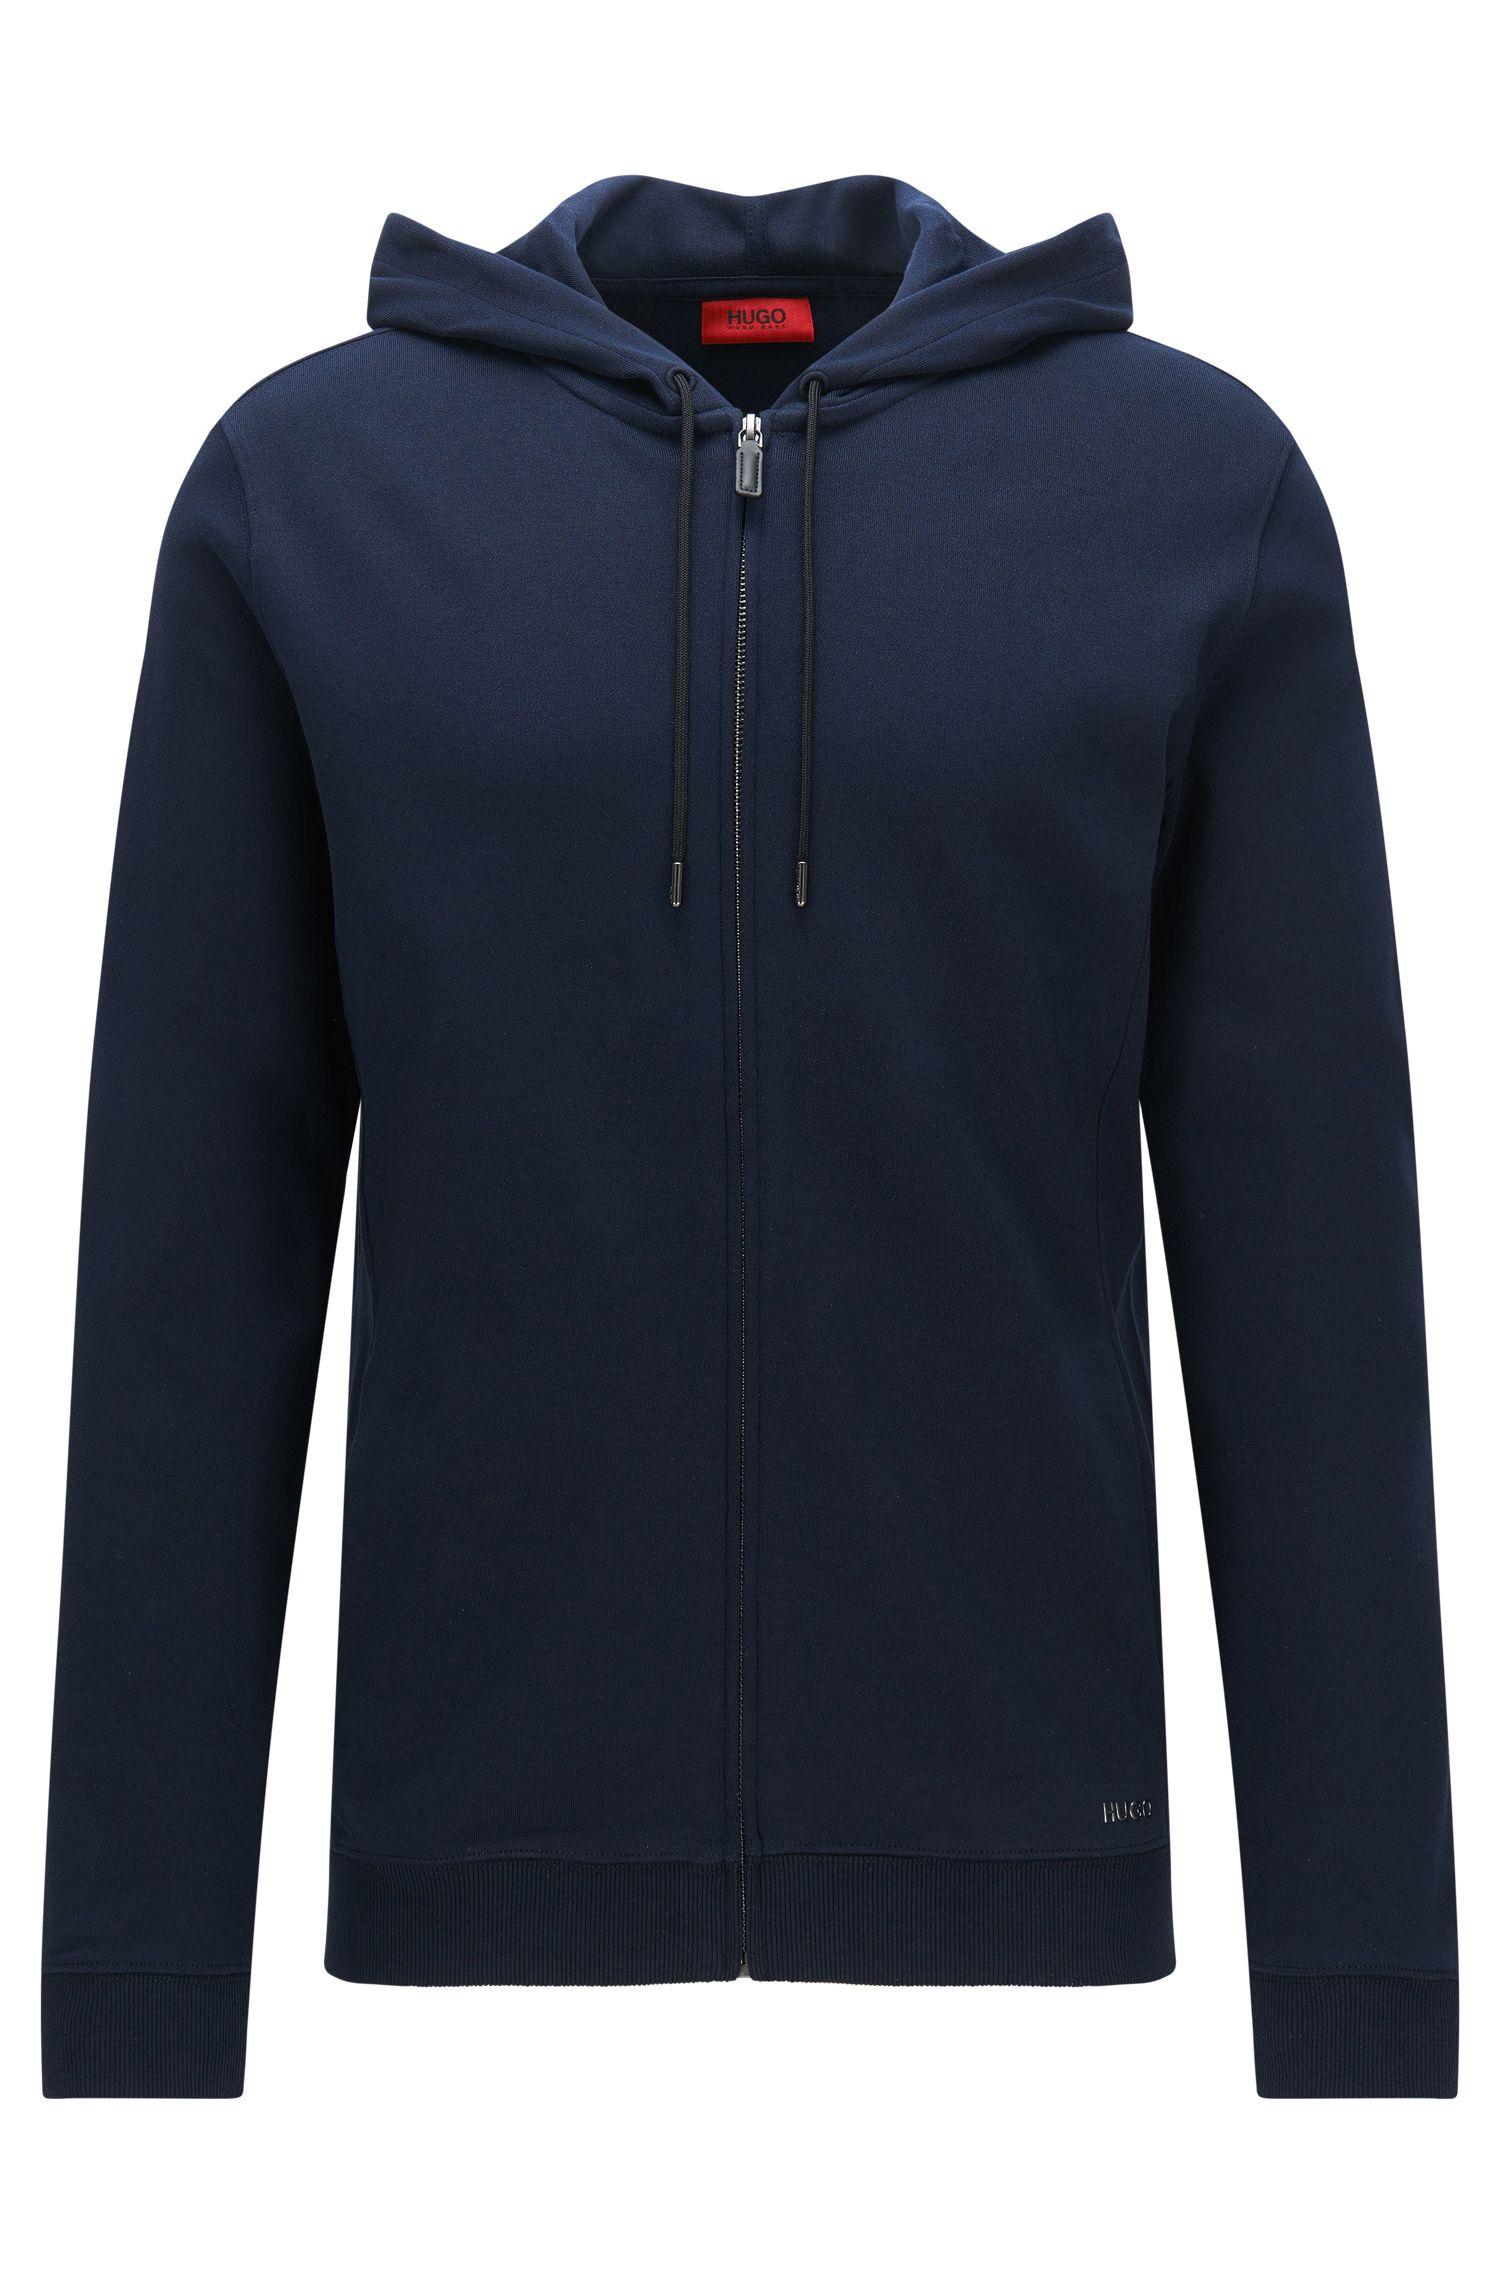 Relaxed-Fit Sweatshirt-Jacke aus Baumwolle mit Kapuze: 'Delinger'